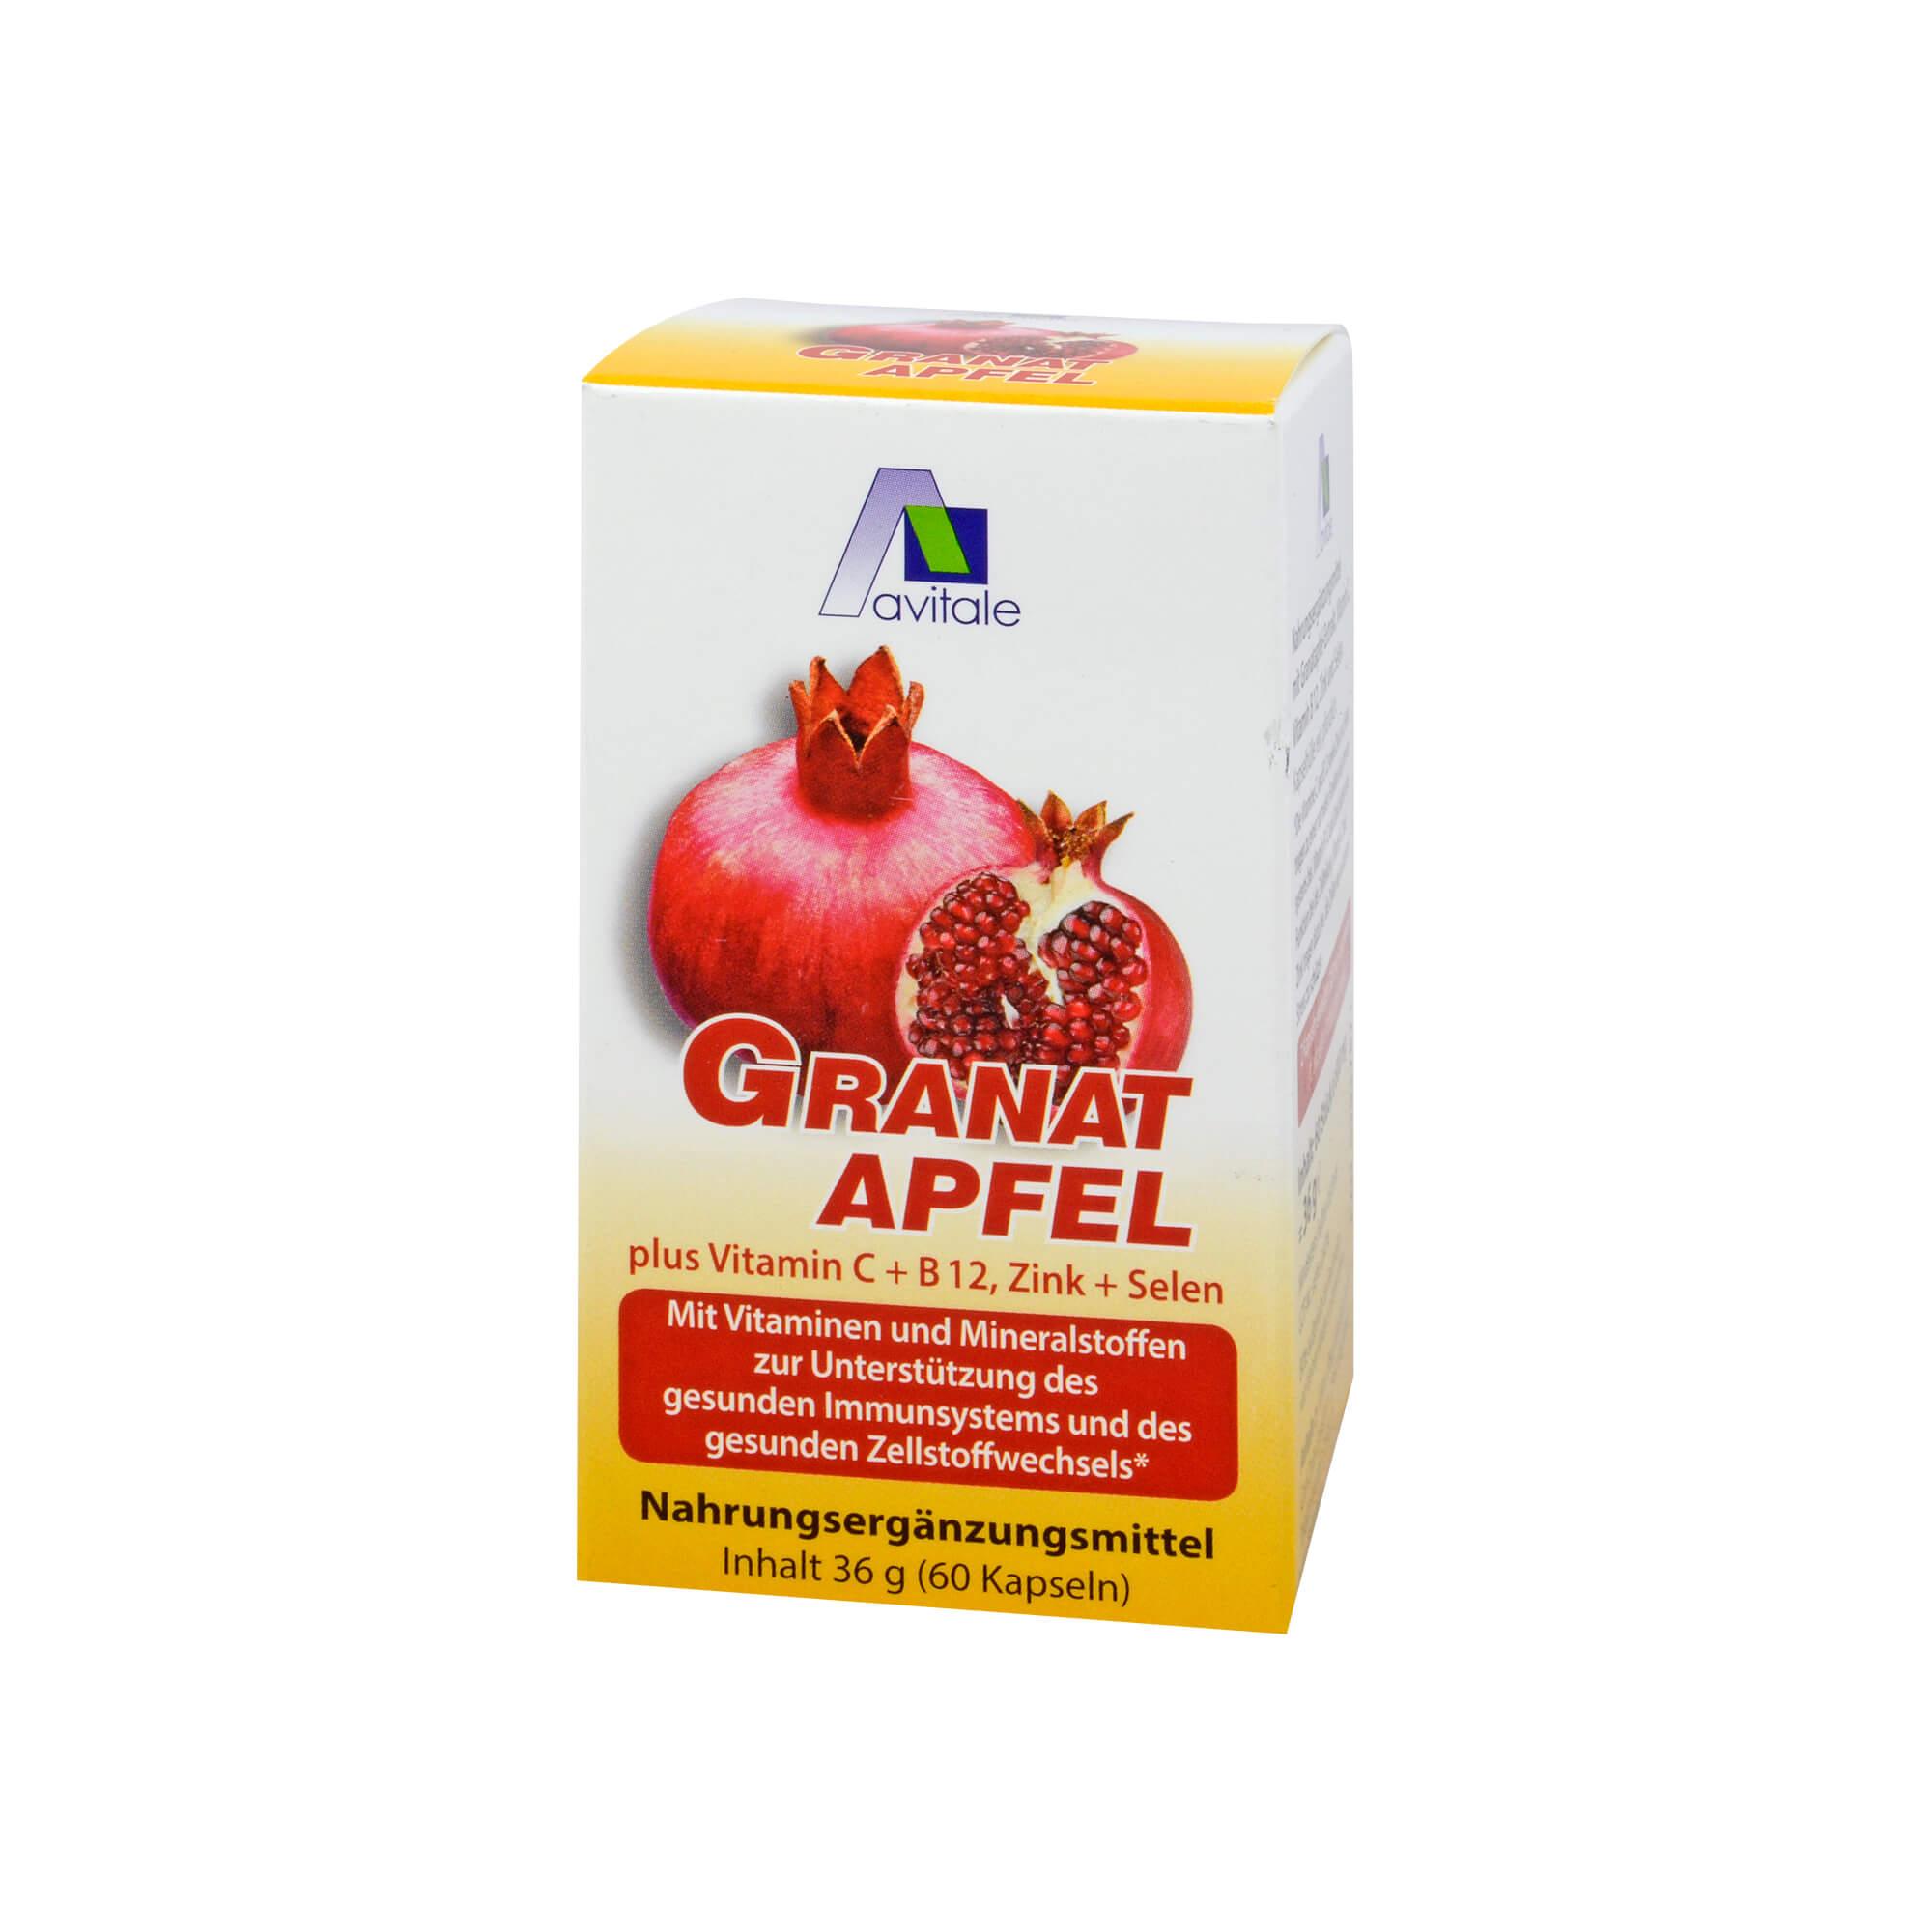 Granatapfel 500mg + Vitamin C + B12 + Zink + Selen